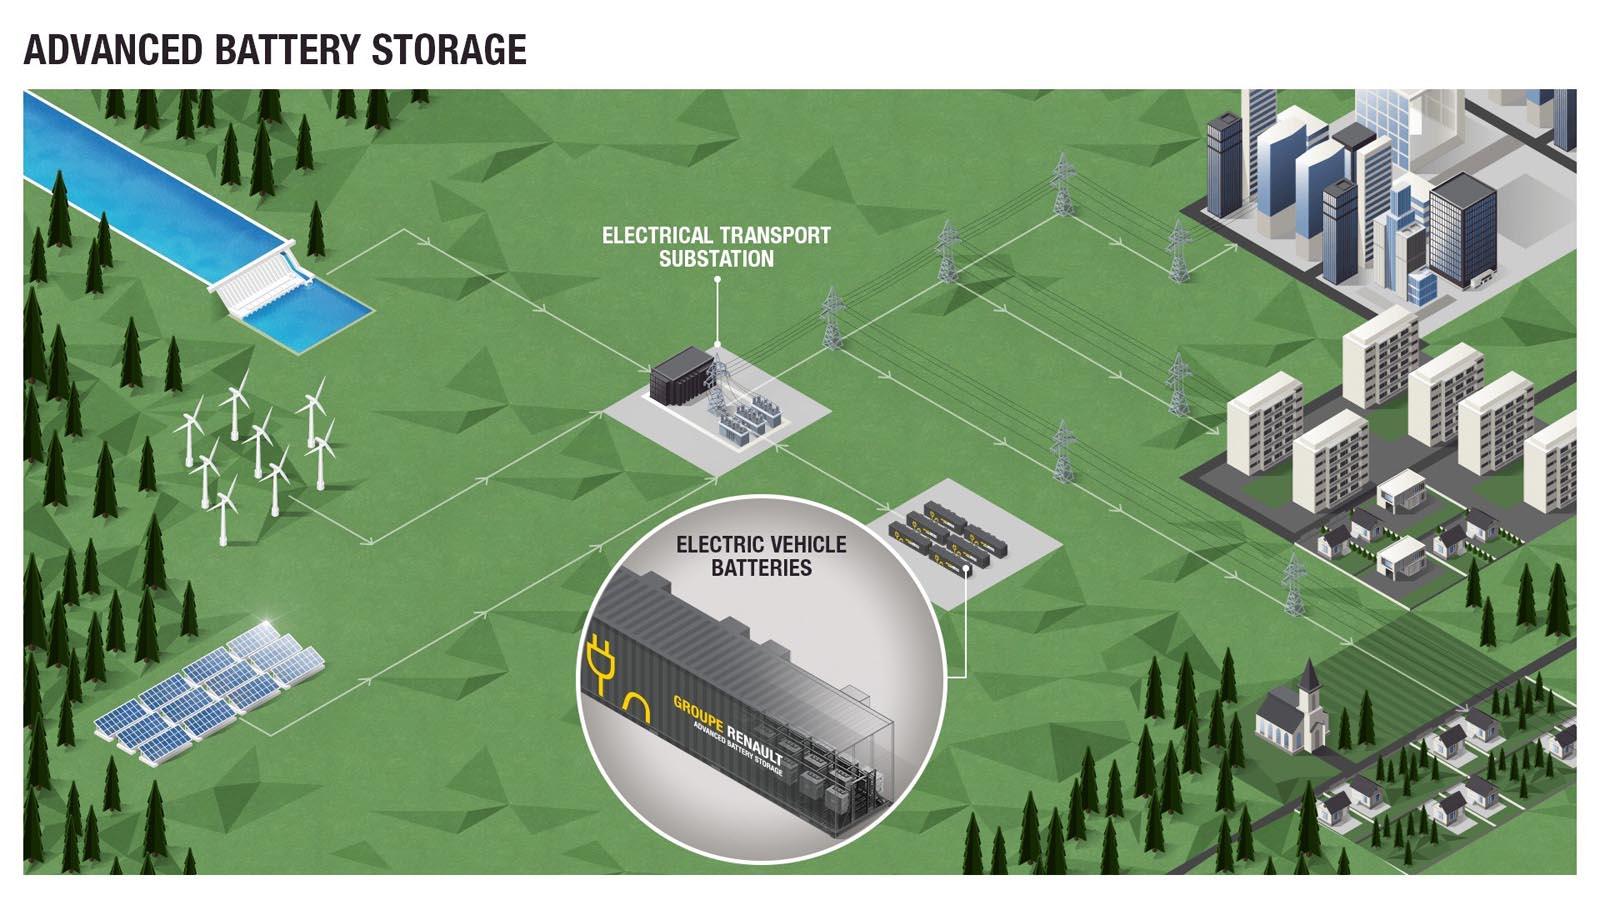 Photo of Renault: Ετοιμάζει τον μεγαλύτερο σταθμό αποθήκευσης ενέργειας στην Ευρώπη